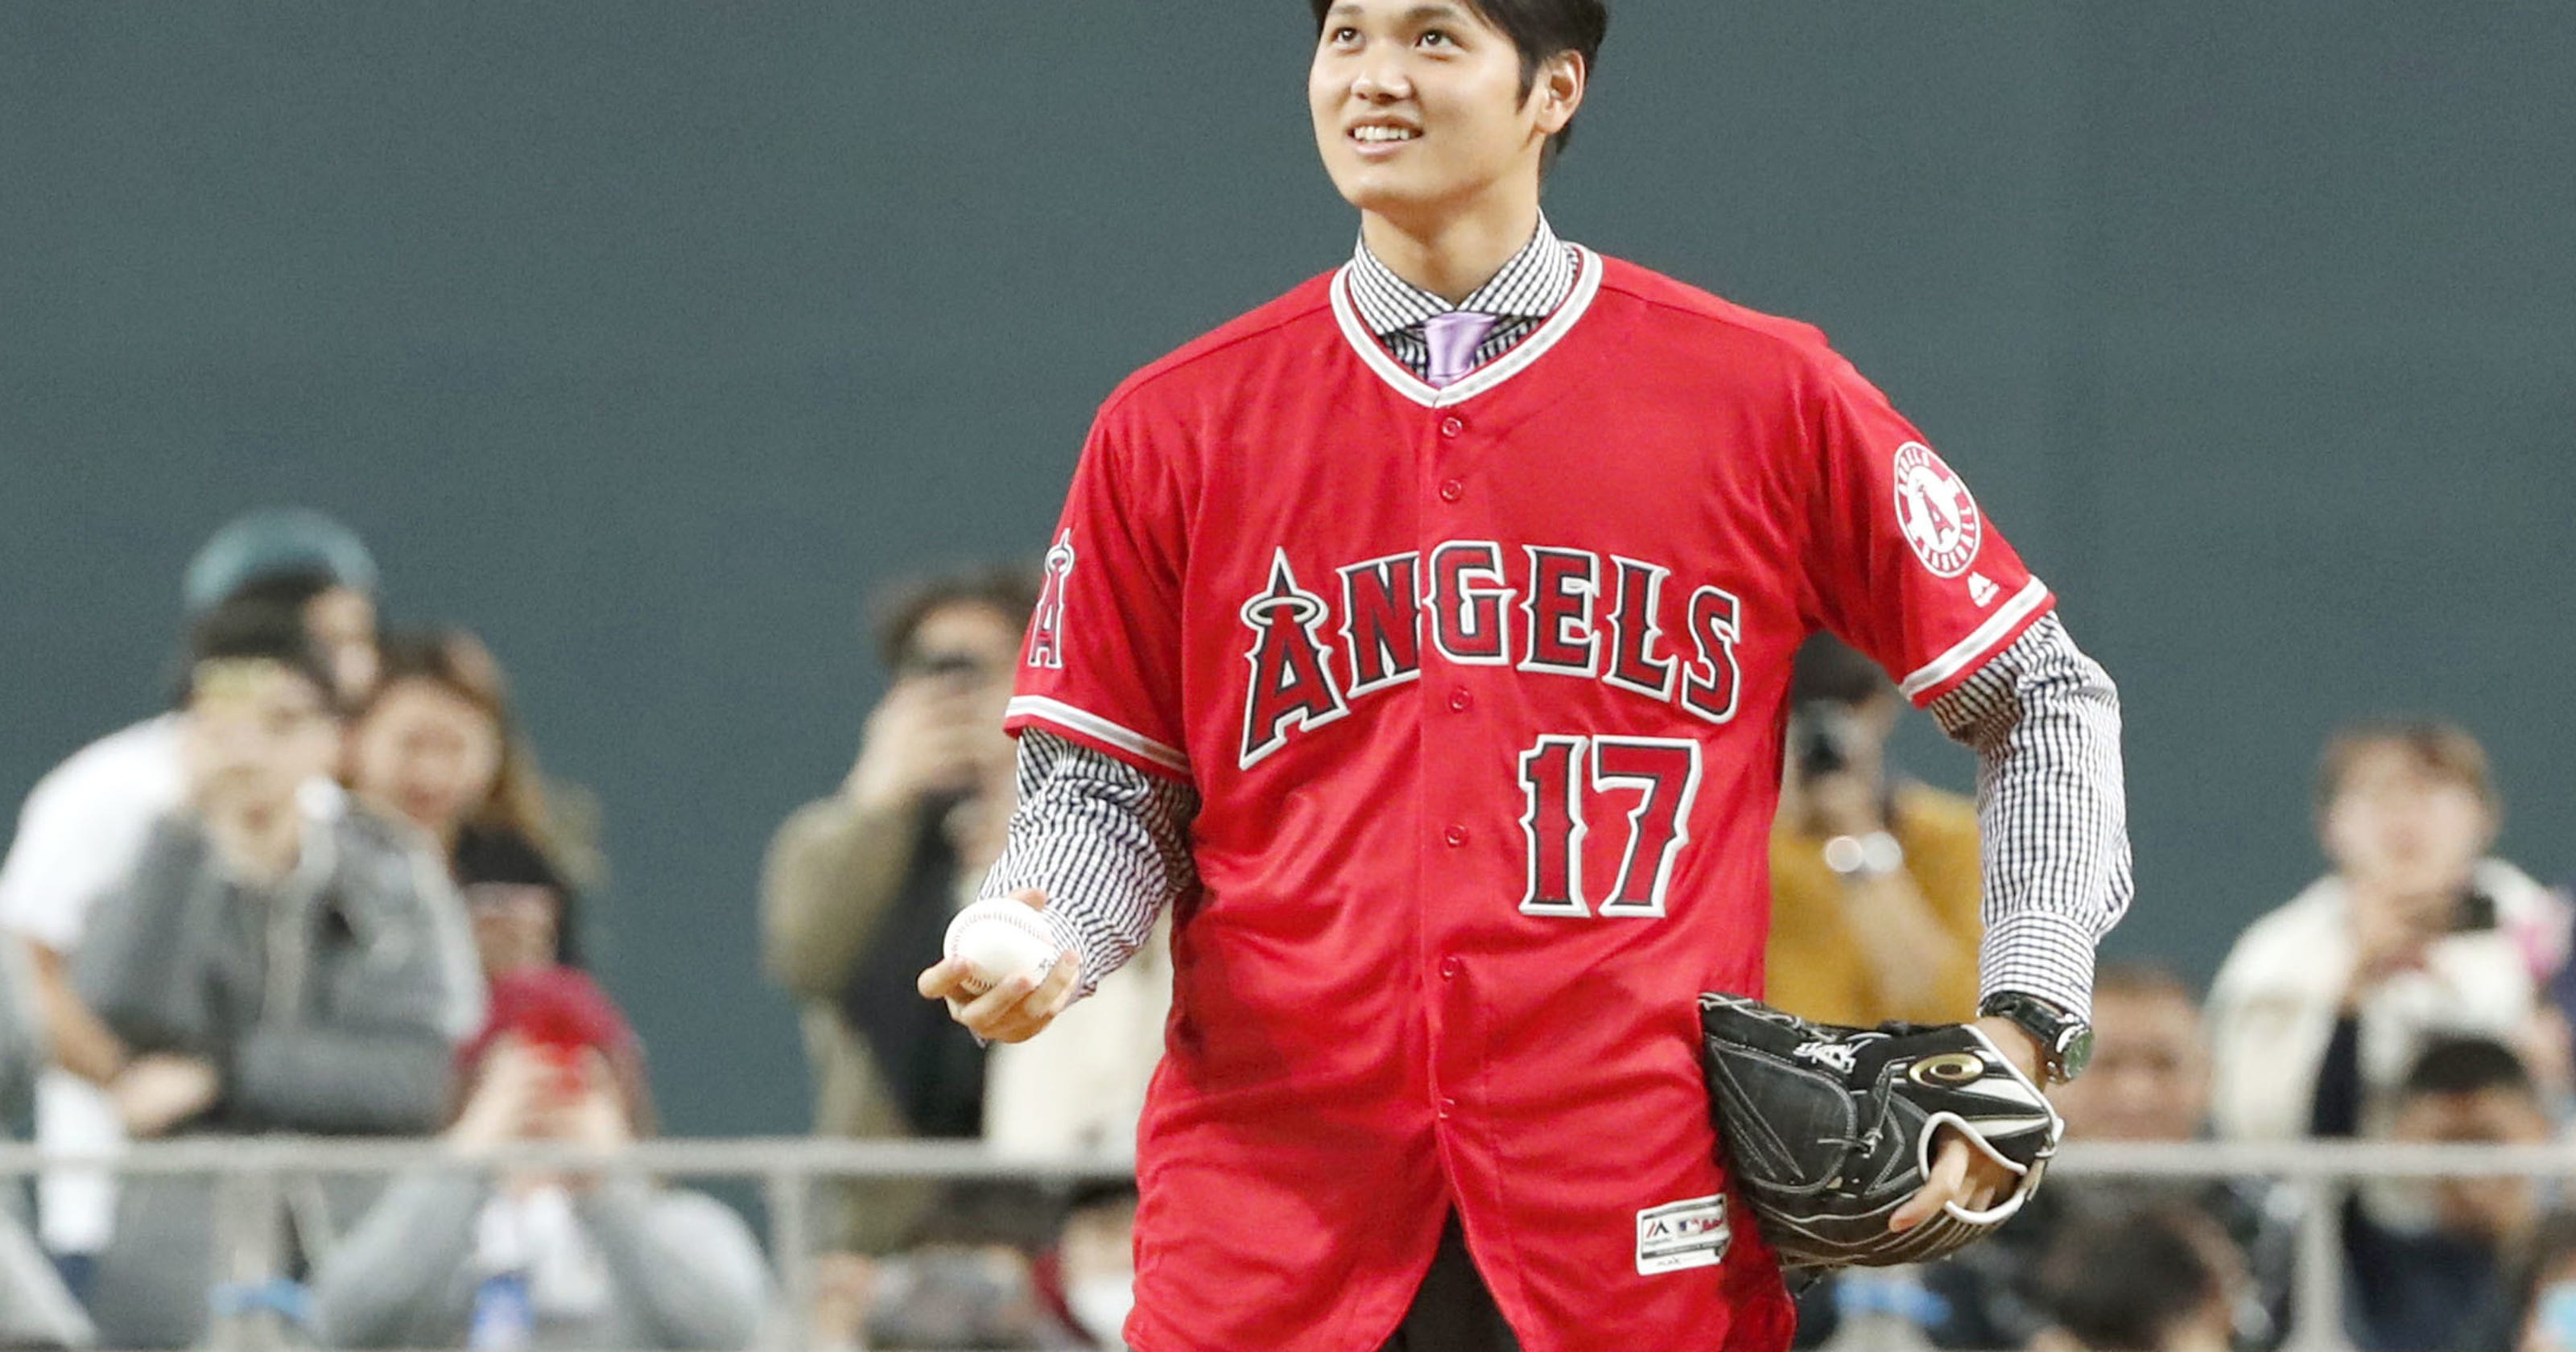 new product 766e8 6e0da Shohei Ohtani bids farewell to fans in Japan ahead of Angels ...